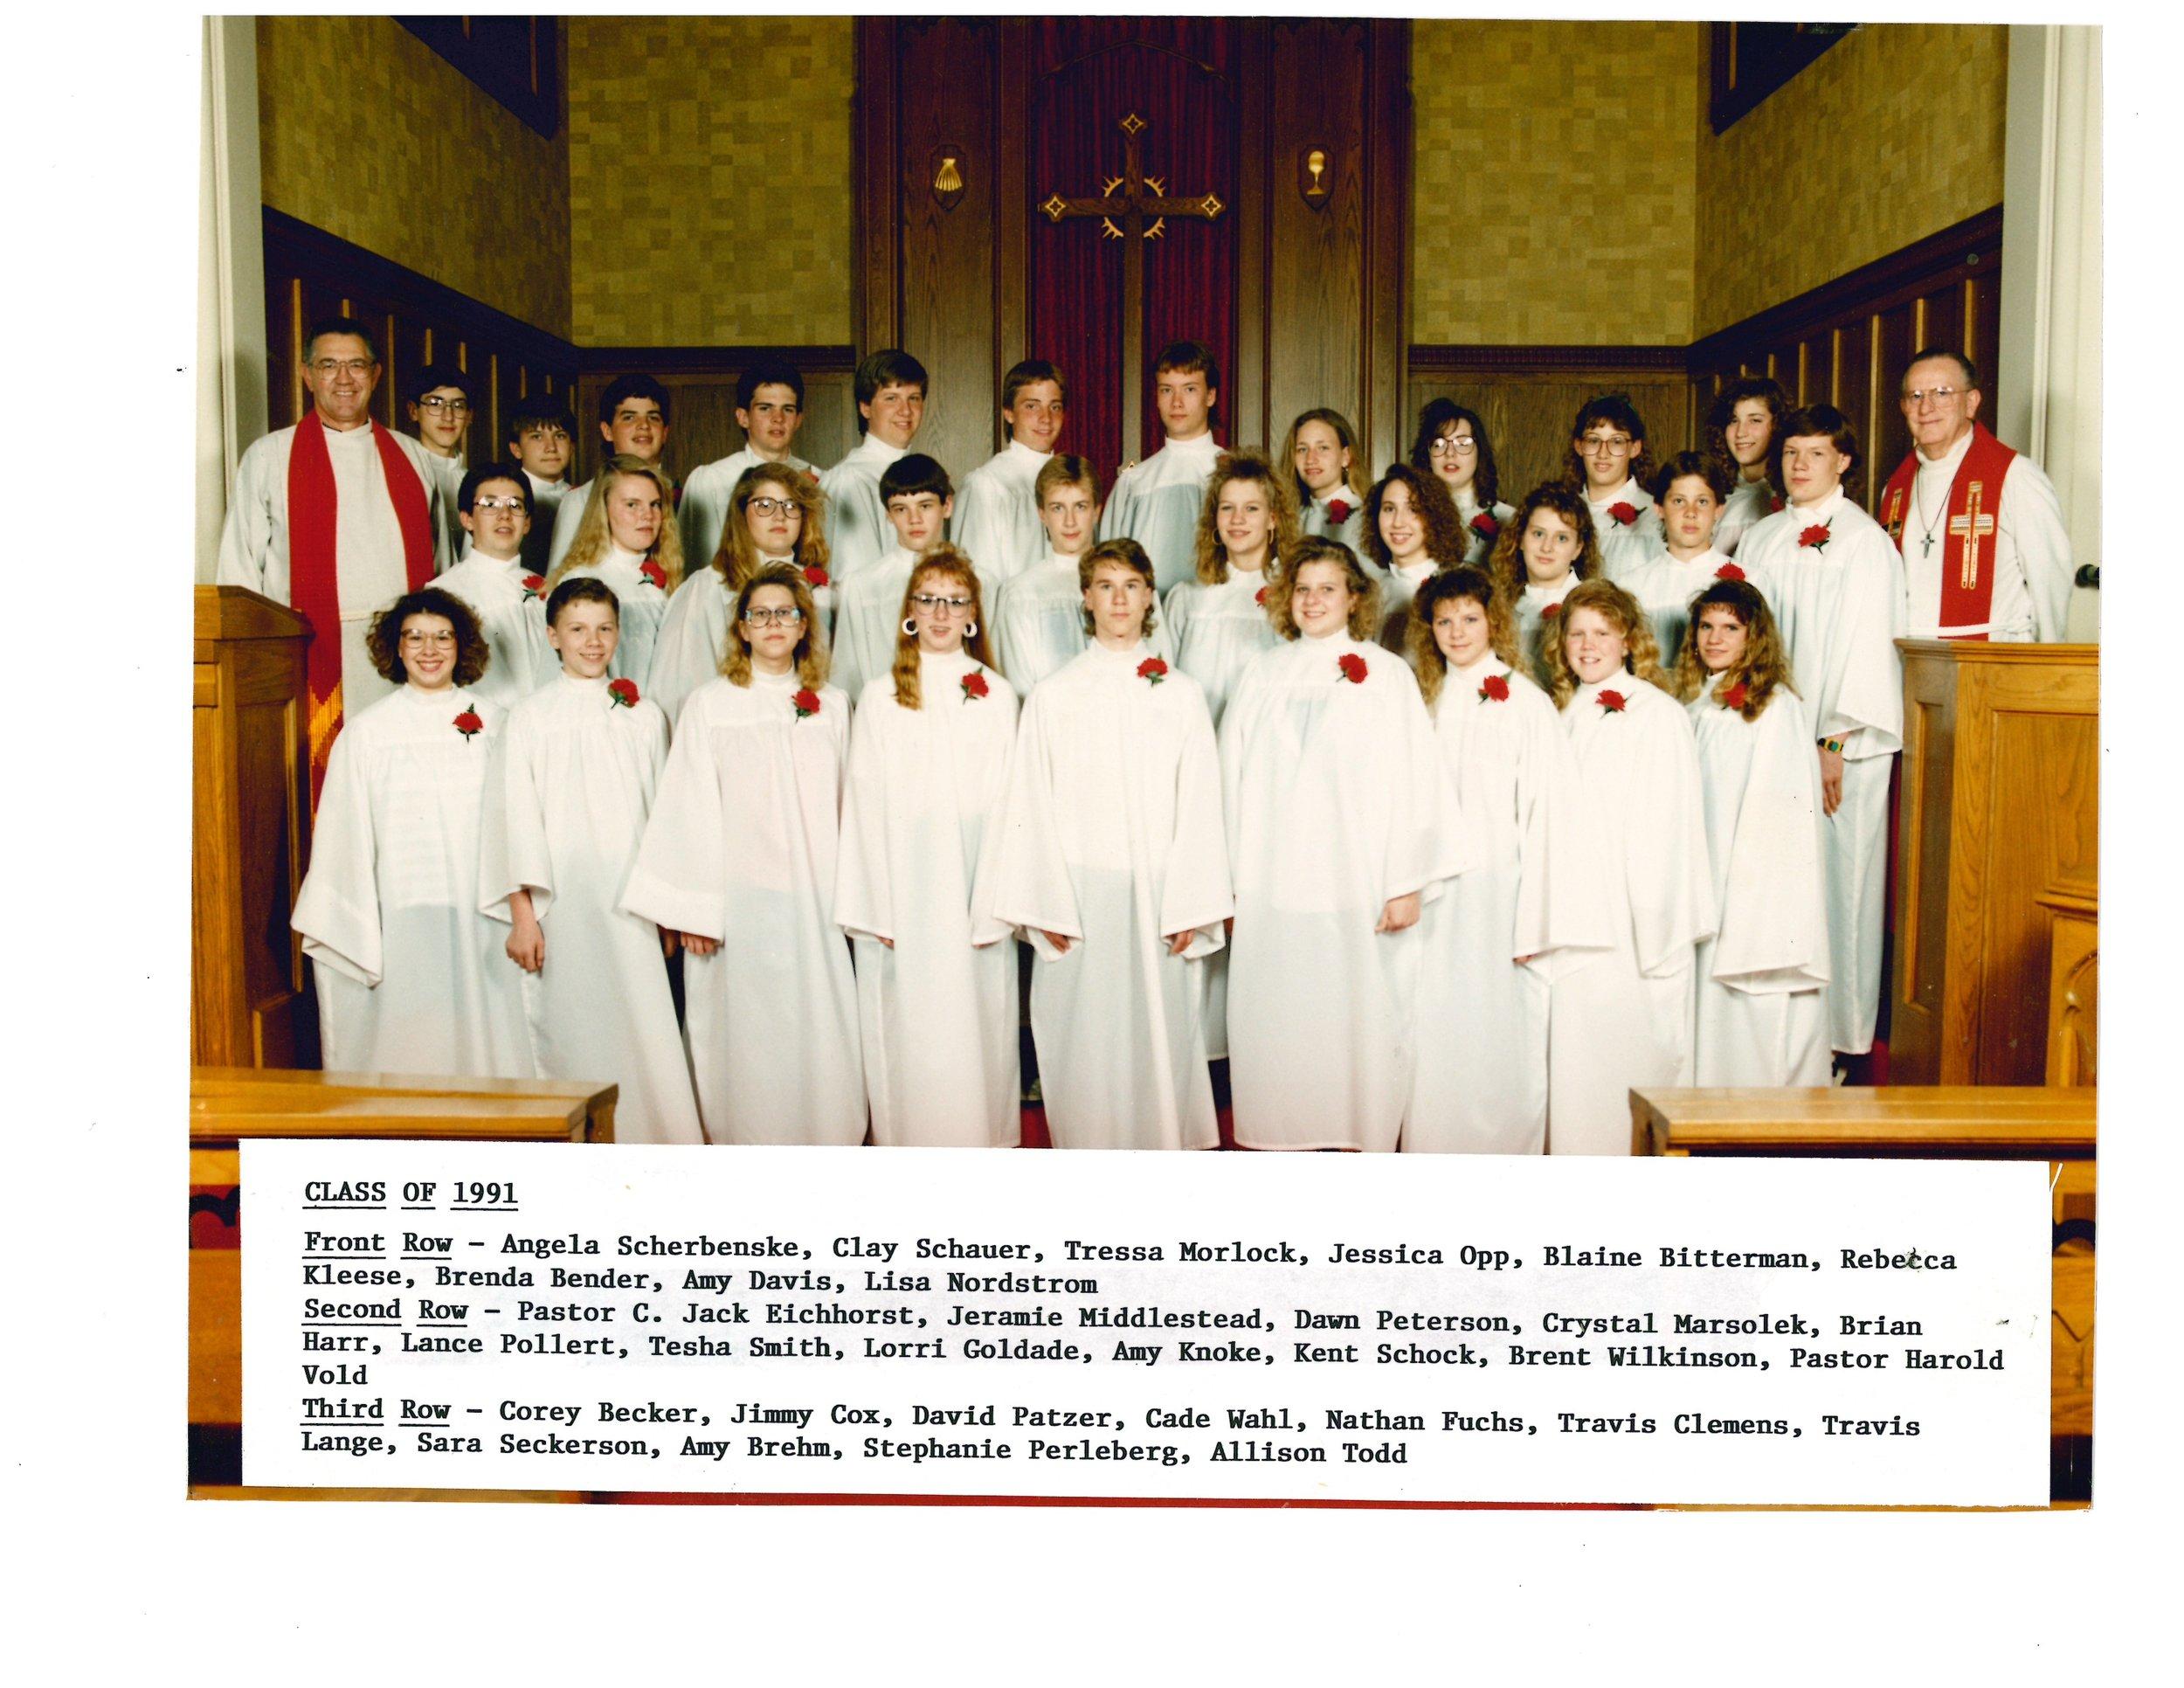 1991 confirmation photo.jpg